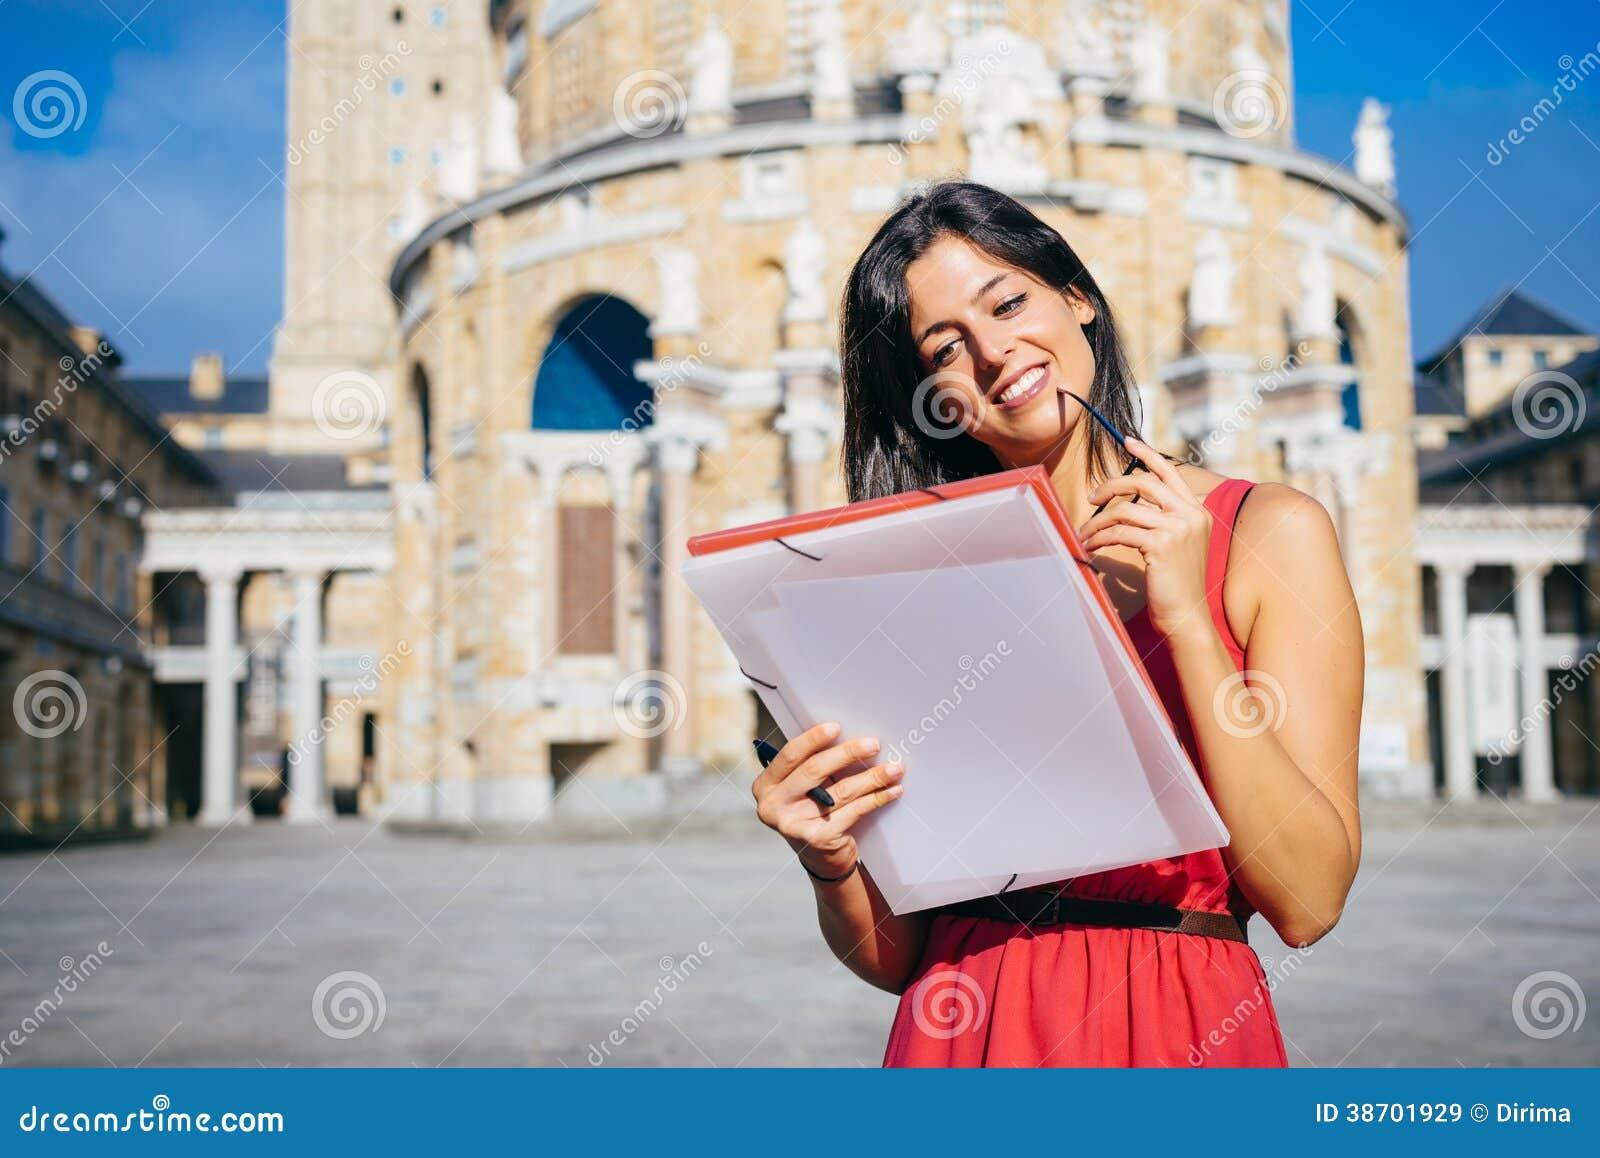 College beautiful female student at university